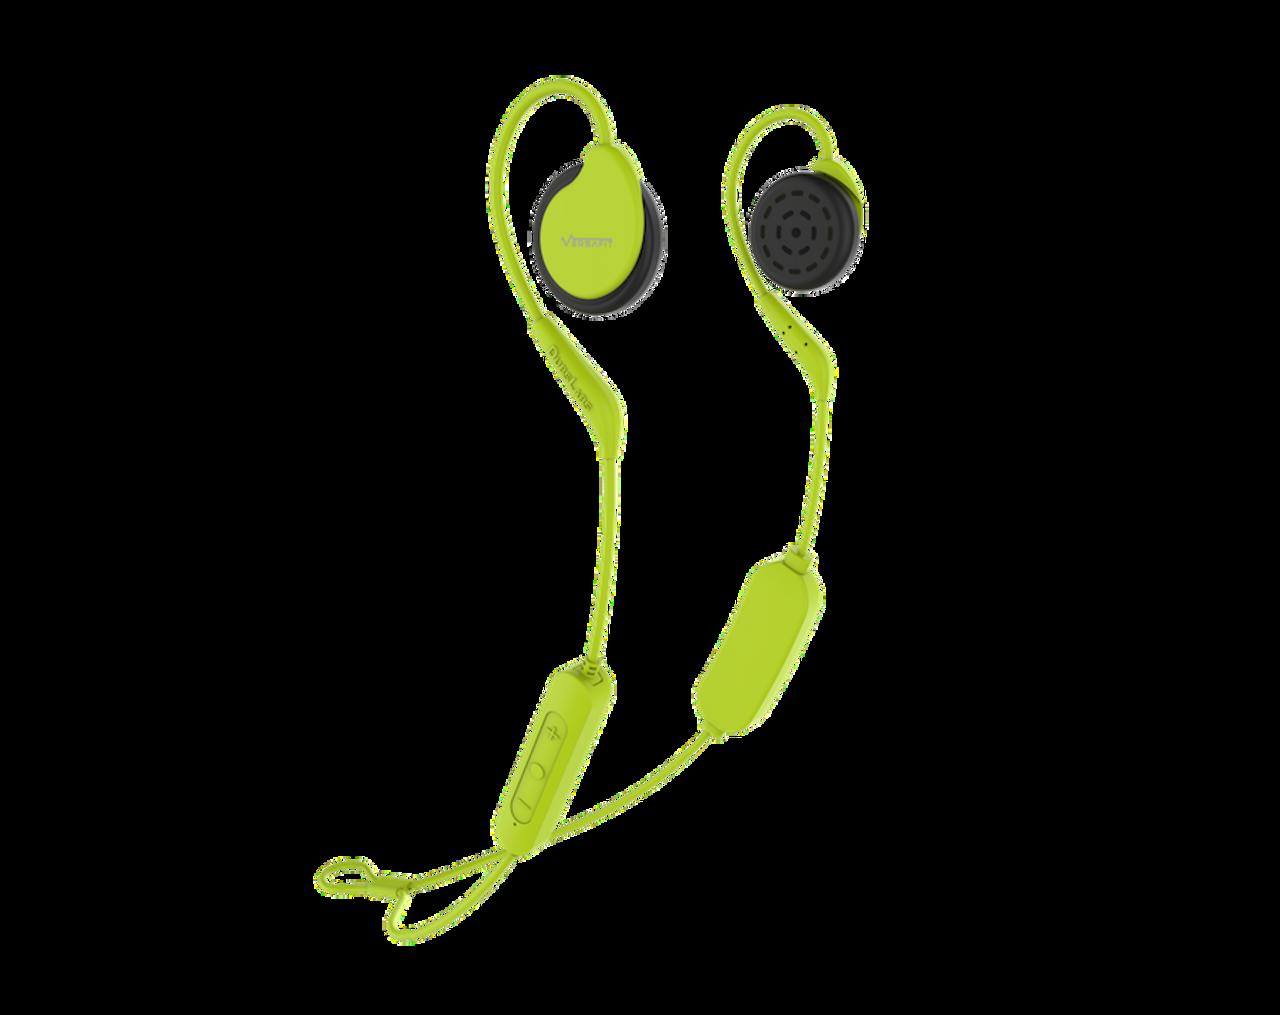 Versafit Wireless Sport Headphones - Intrepid Green